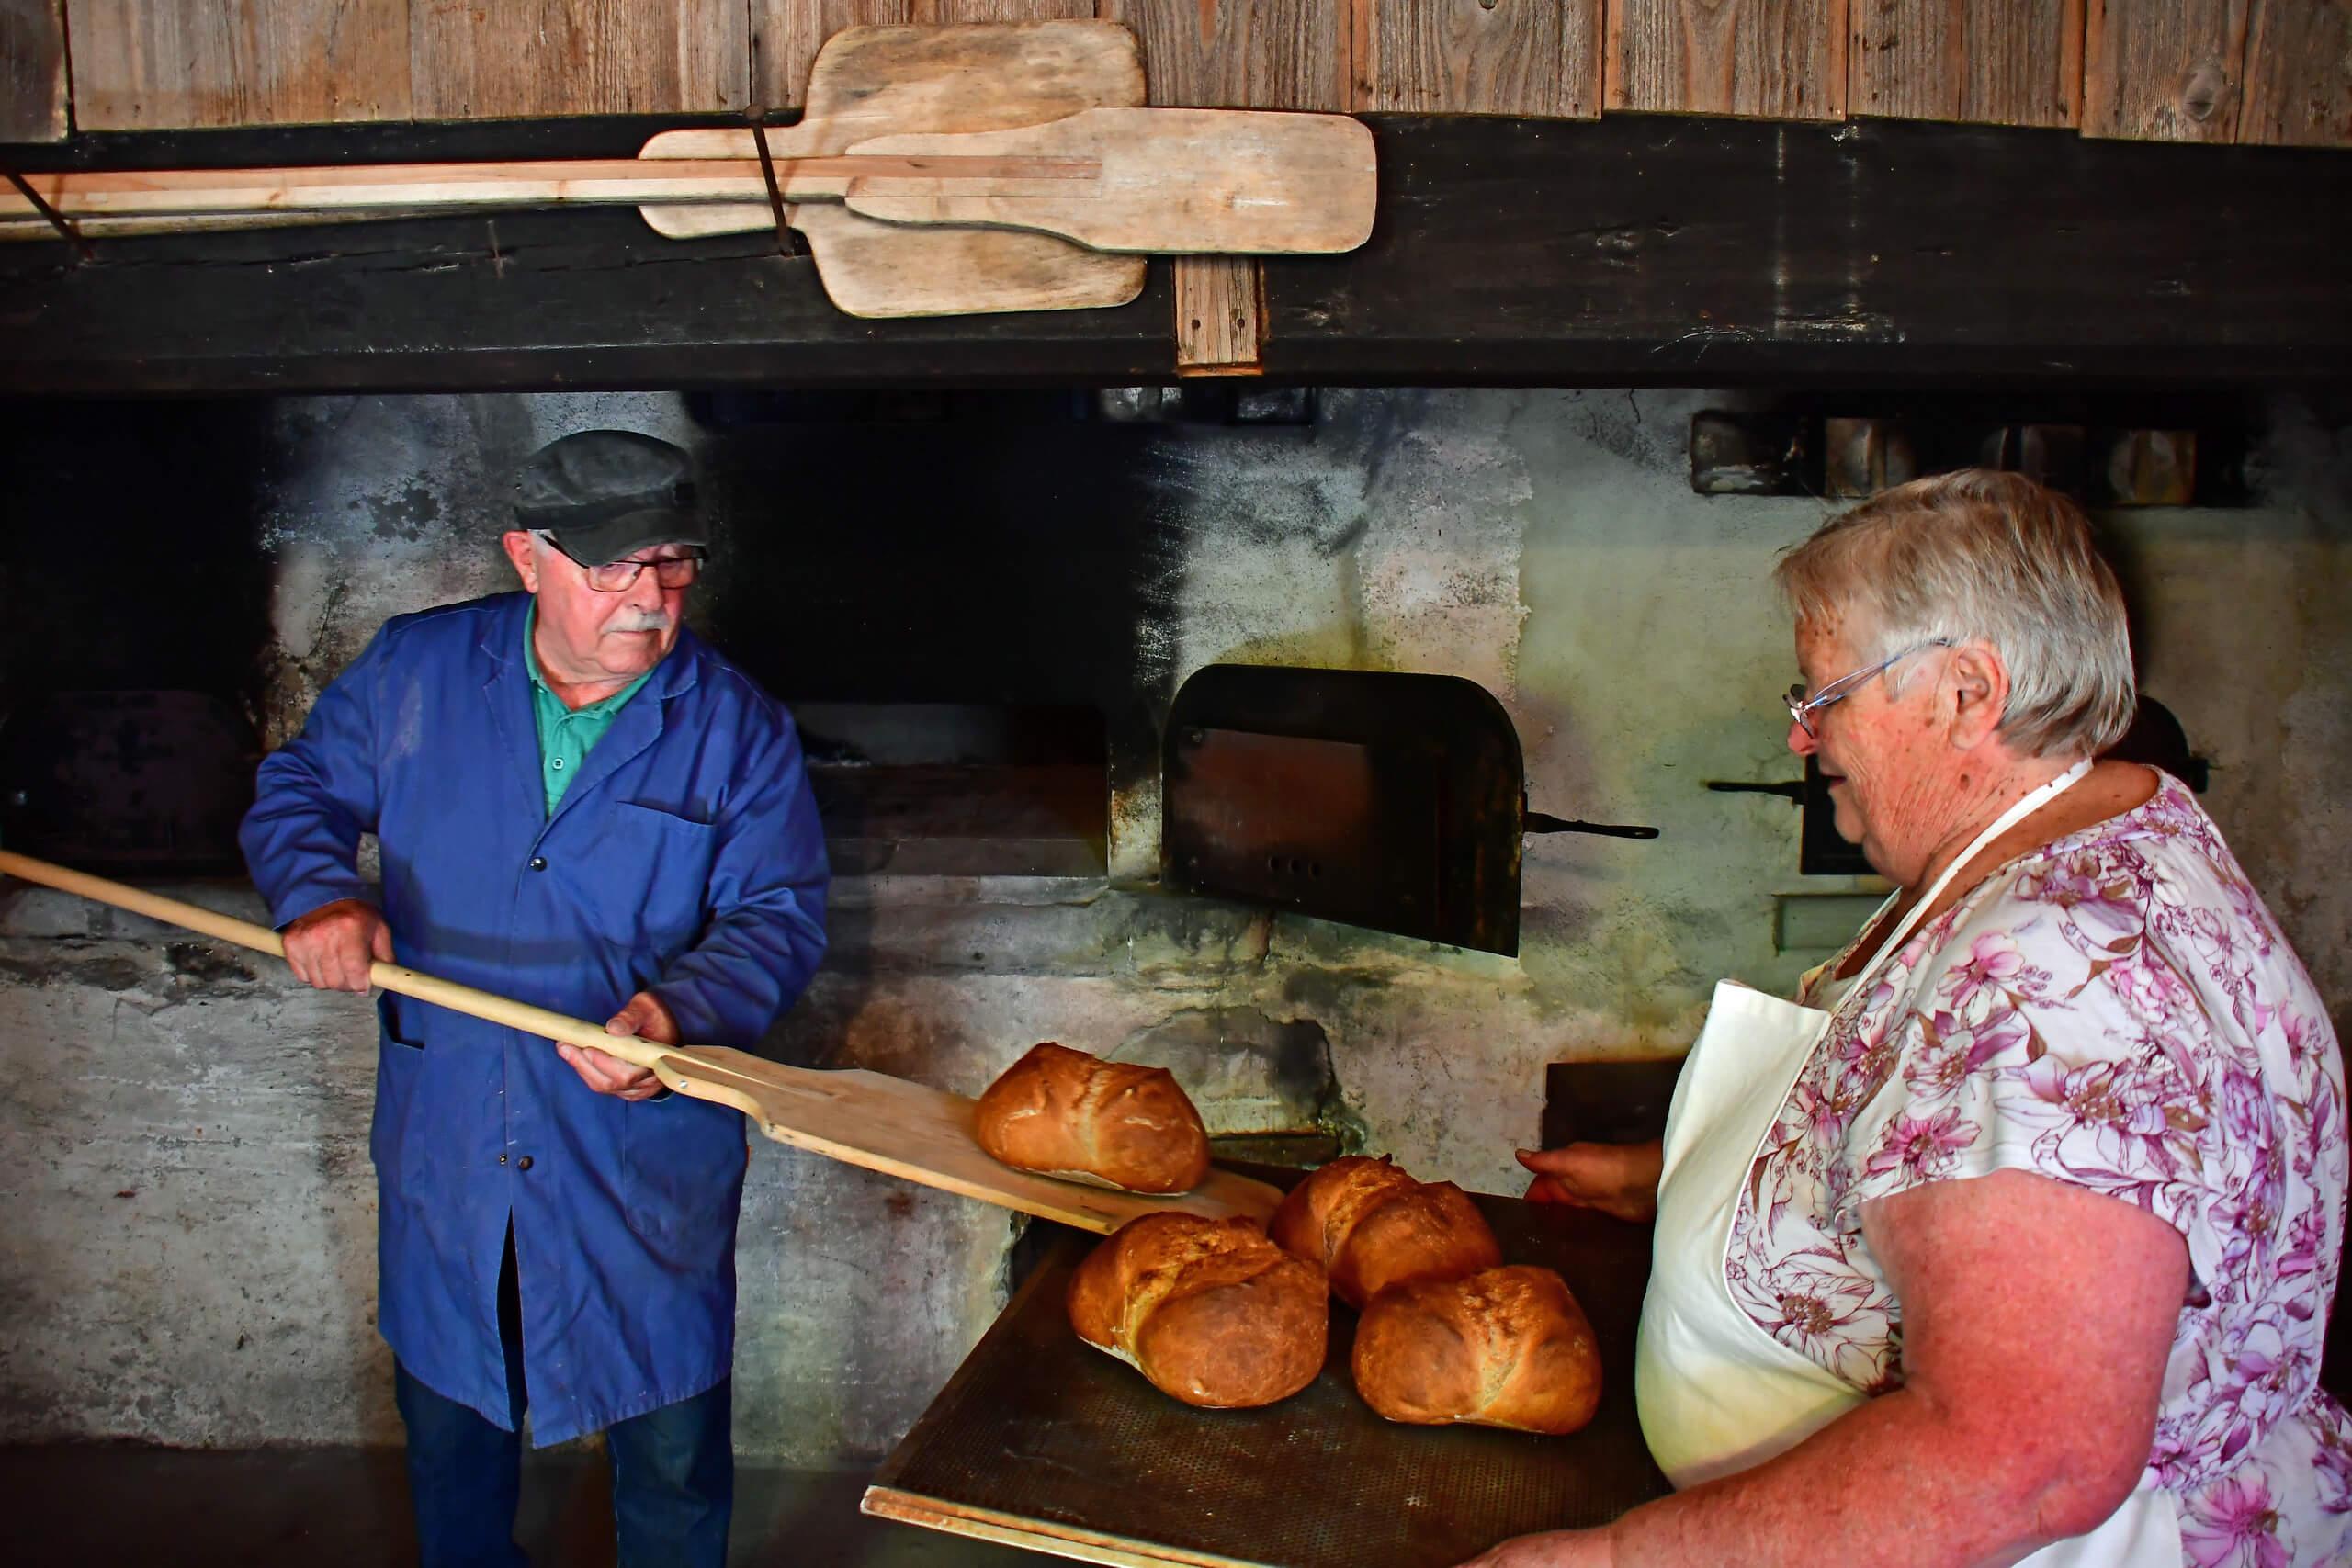 backen-im-alten-ofenhuesi-gebackene-brote